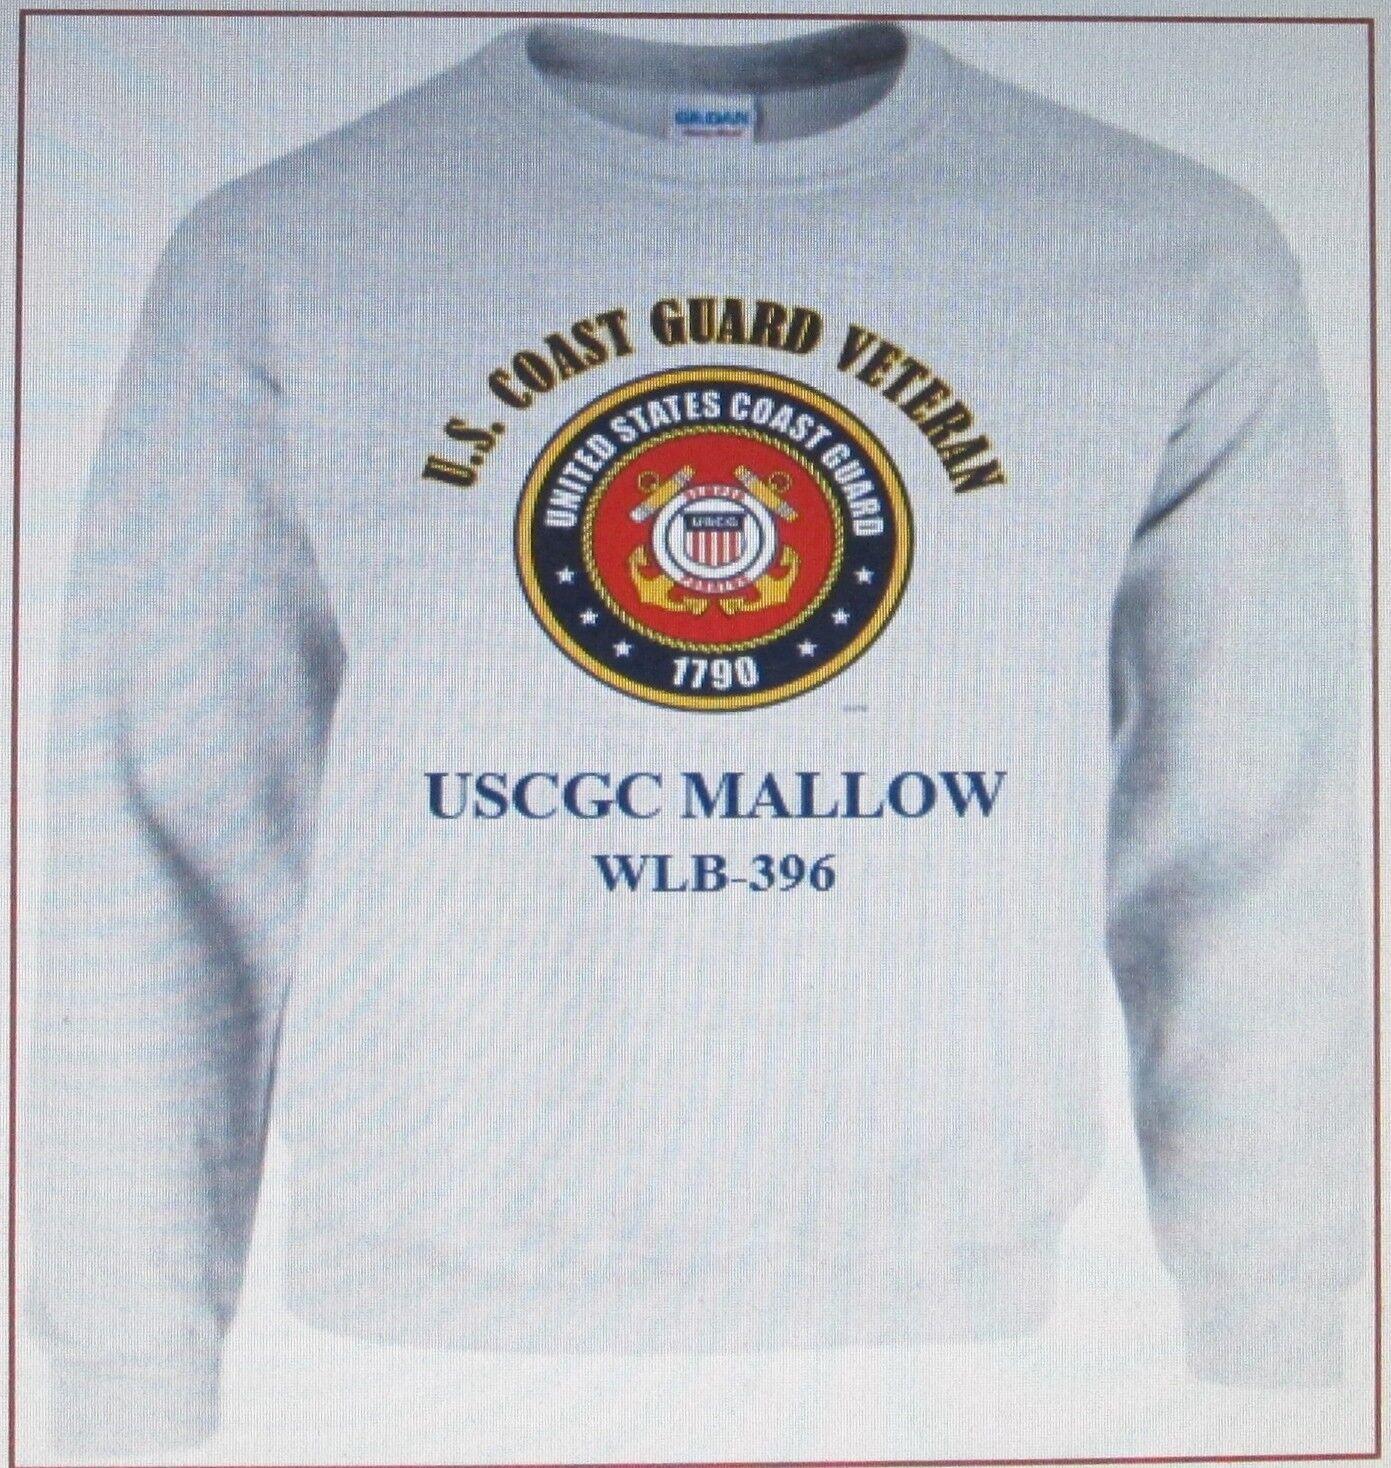 USCGC MALLOW  WLB-396  COAST GUARD VETERAN SWEATSHIRT